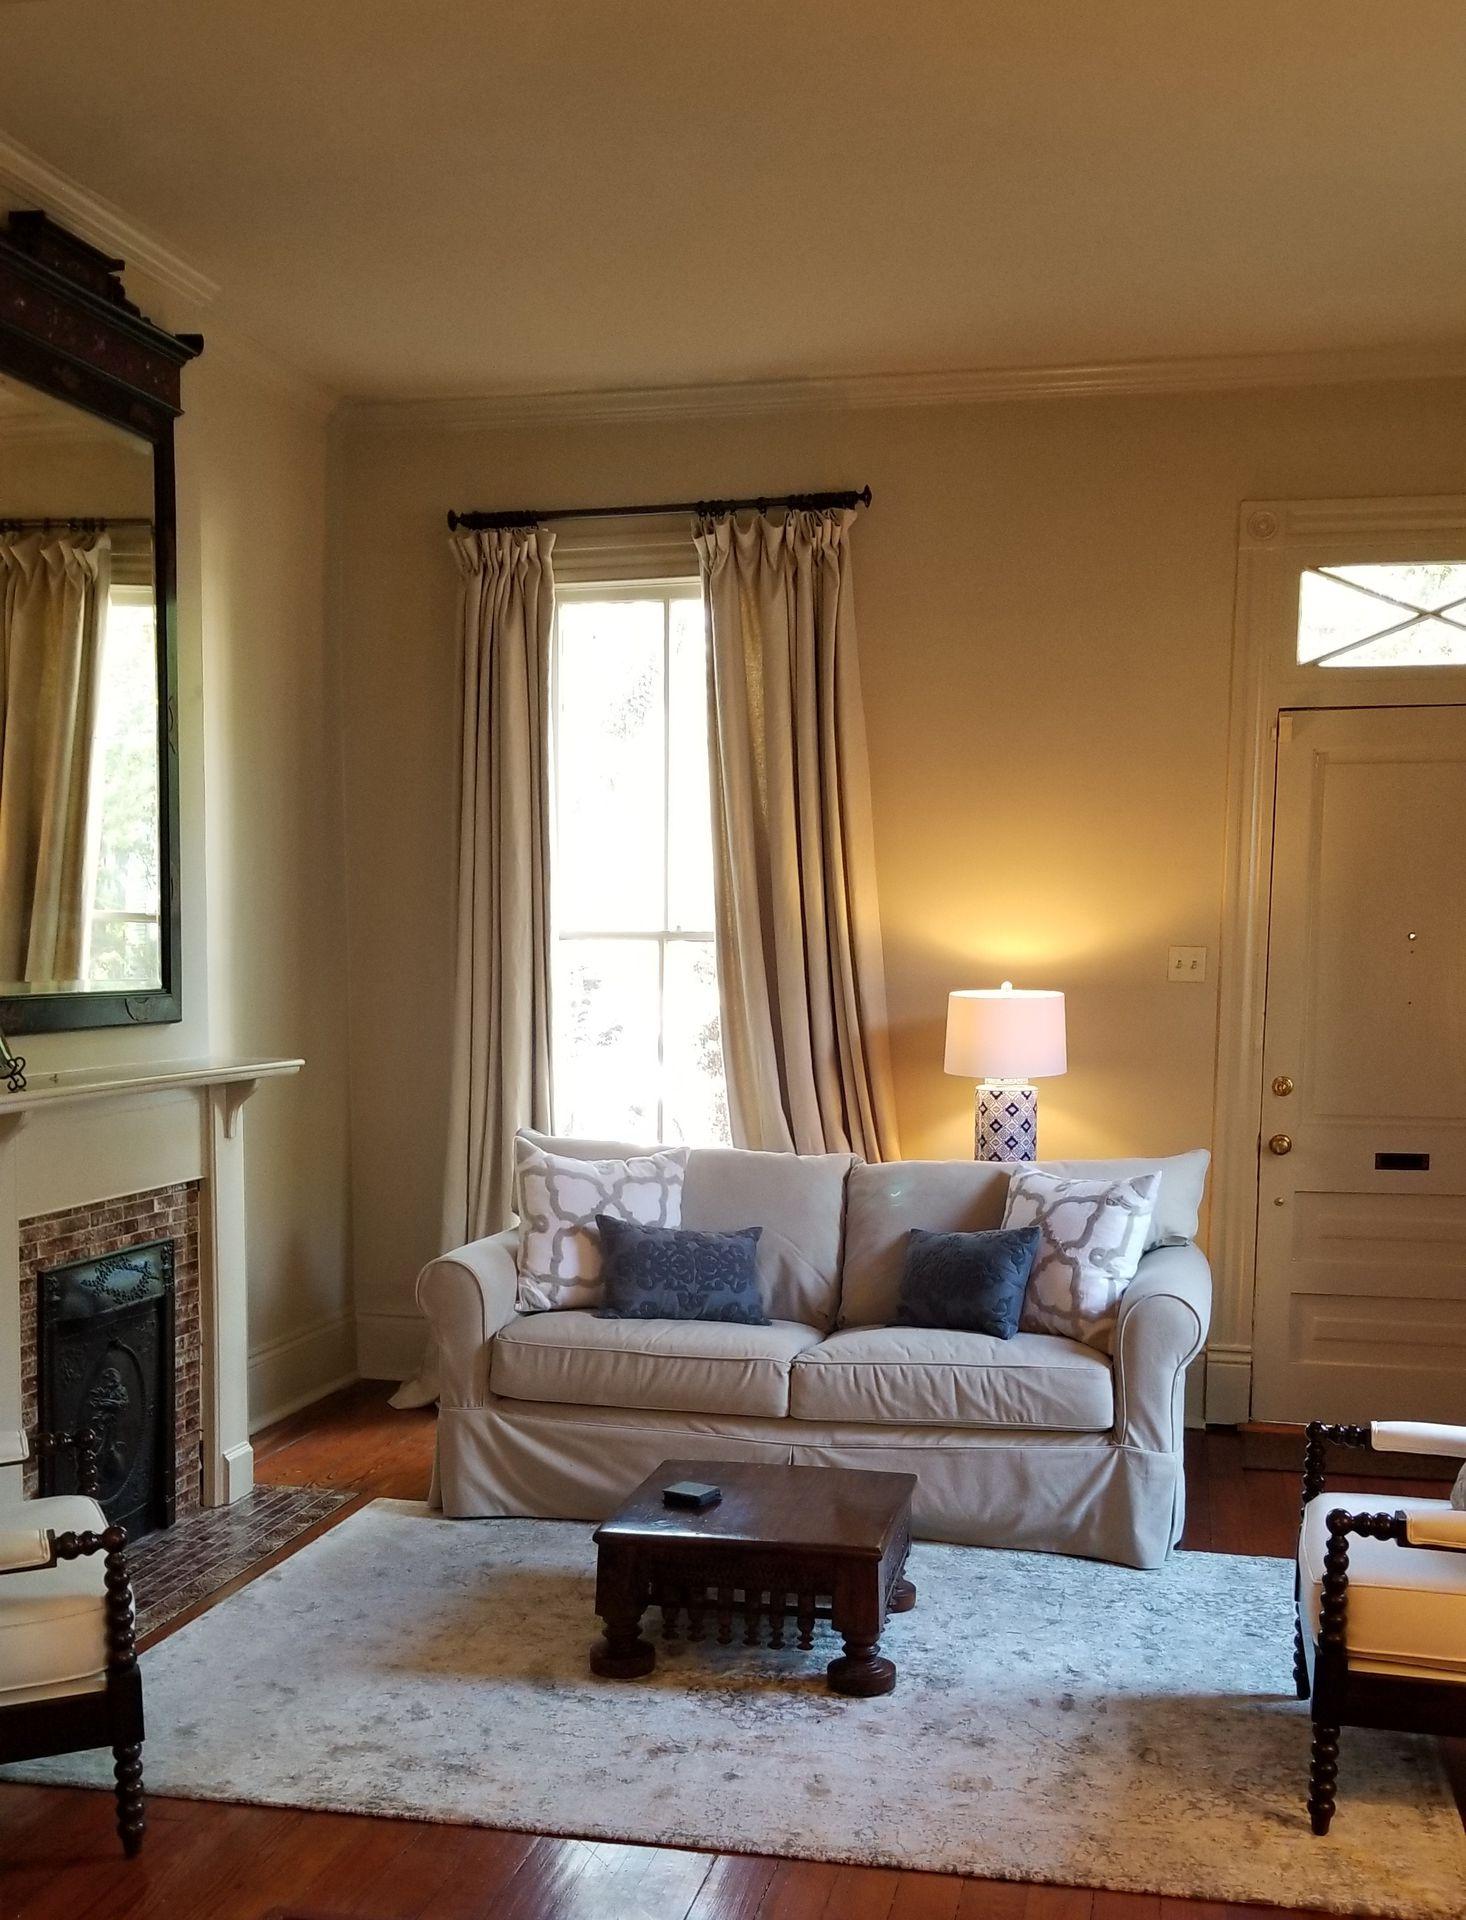 Victorian gem in New Orleans Garden Dist; 2nd home totally reno\'d ...